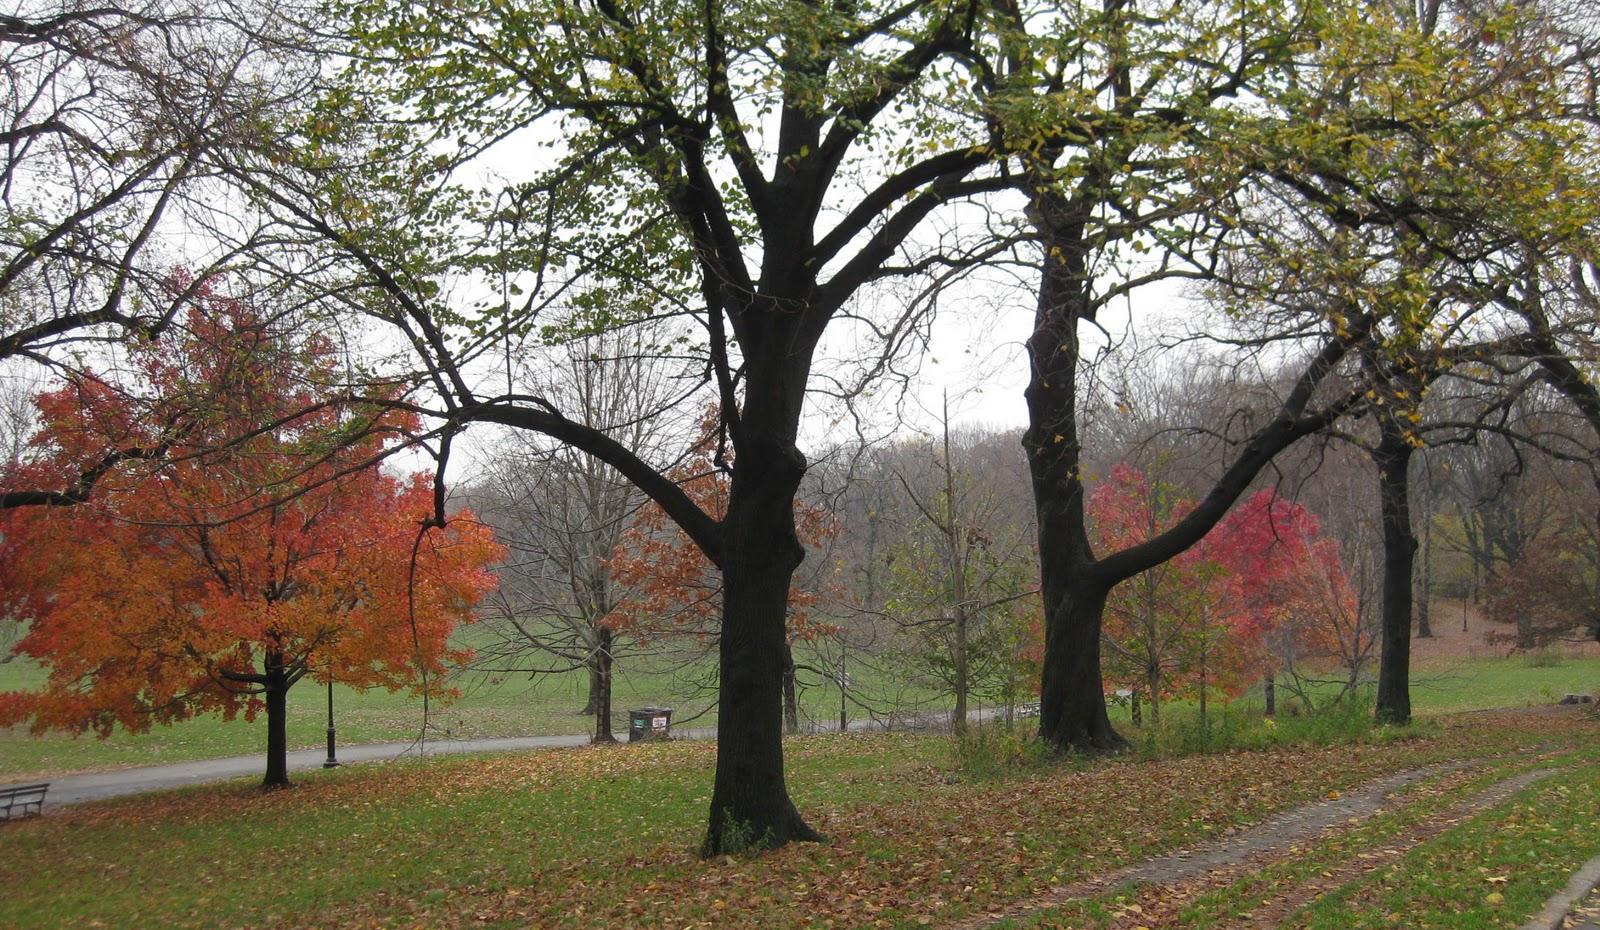 Enjoy the beautiful sights at prospect park new york photos boomsbeat for Prospect park lefferts gardens